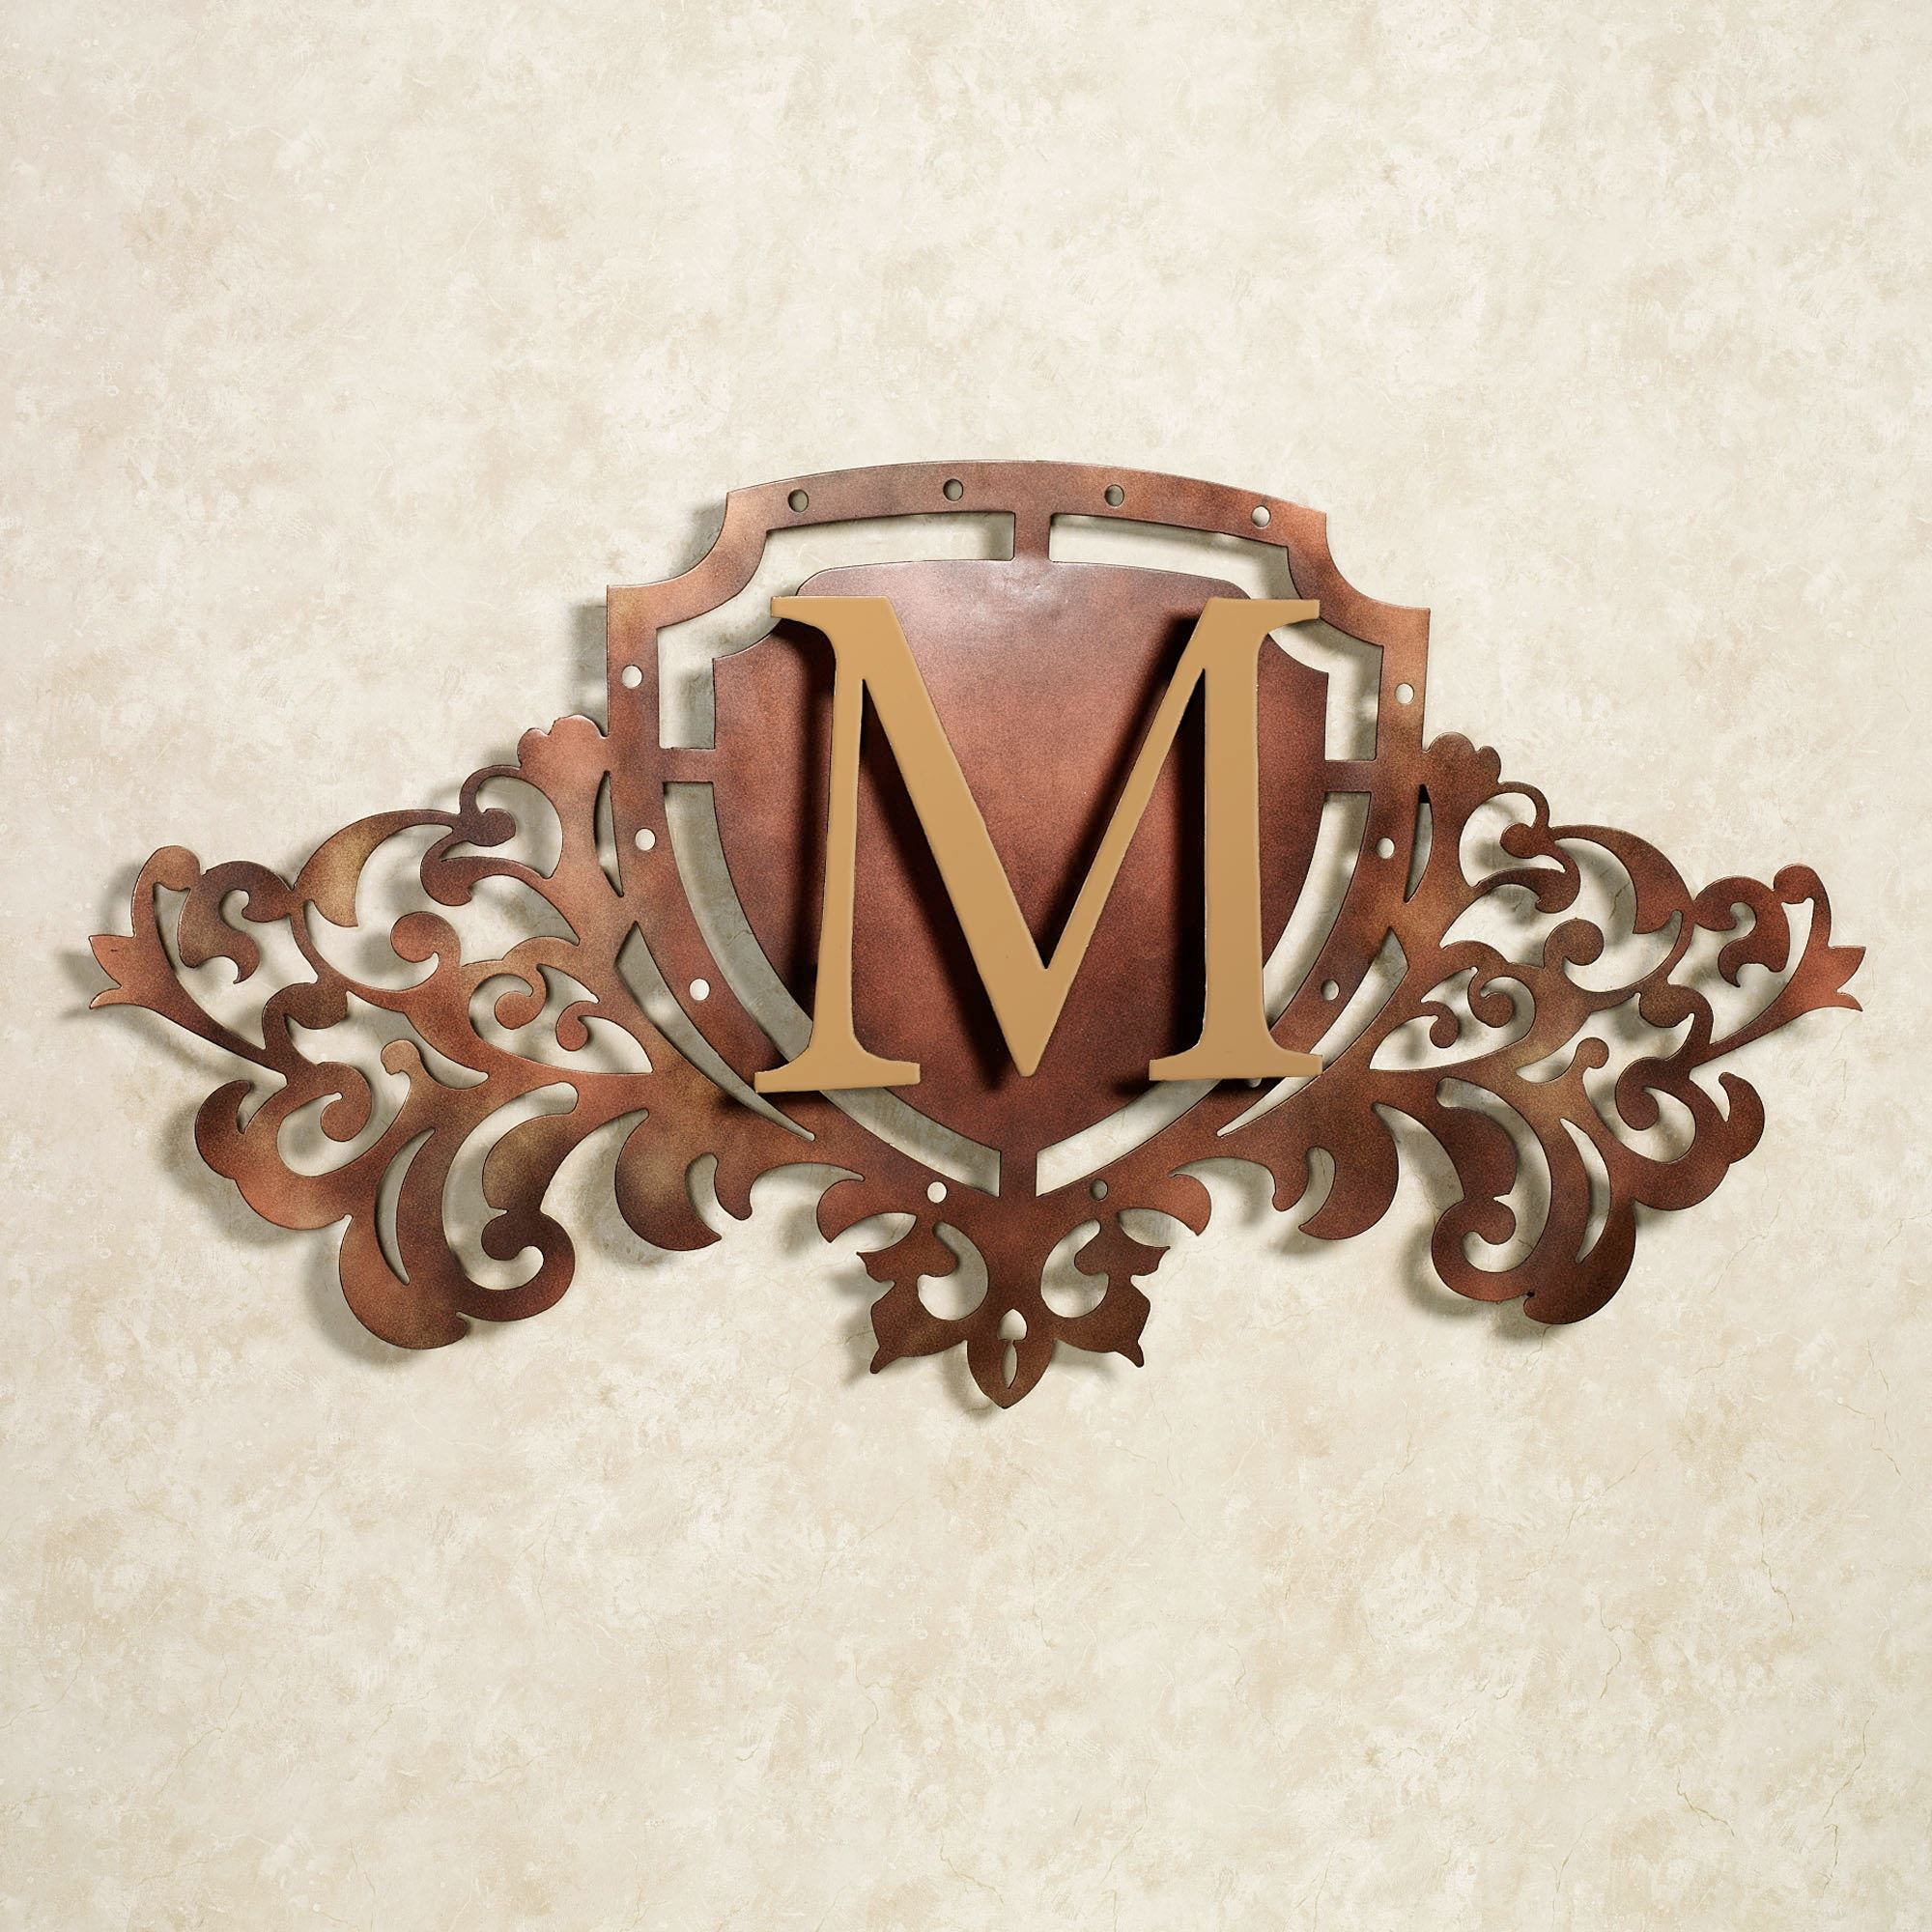 Generations Monogram Crest Metal Wall Art Sign